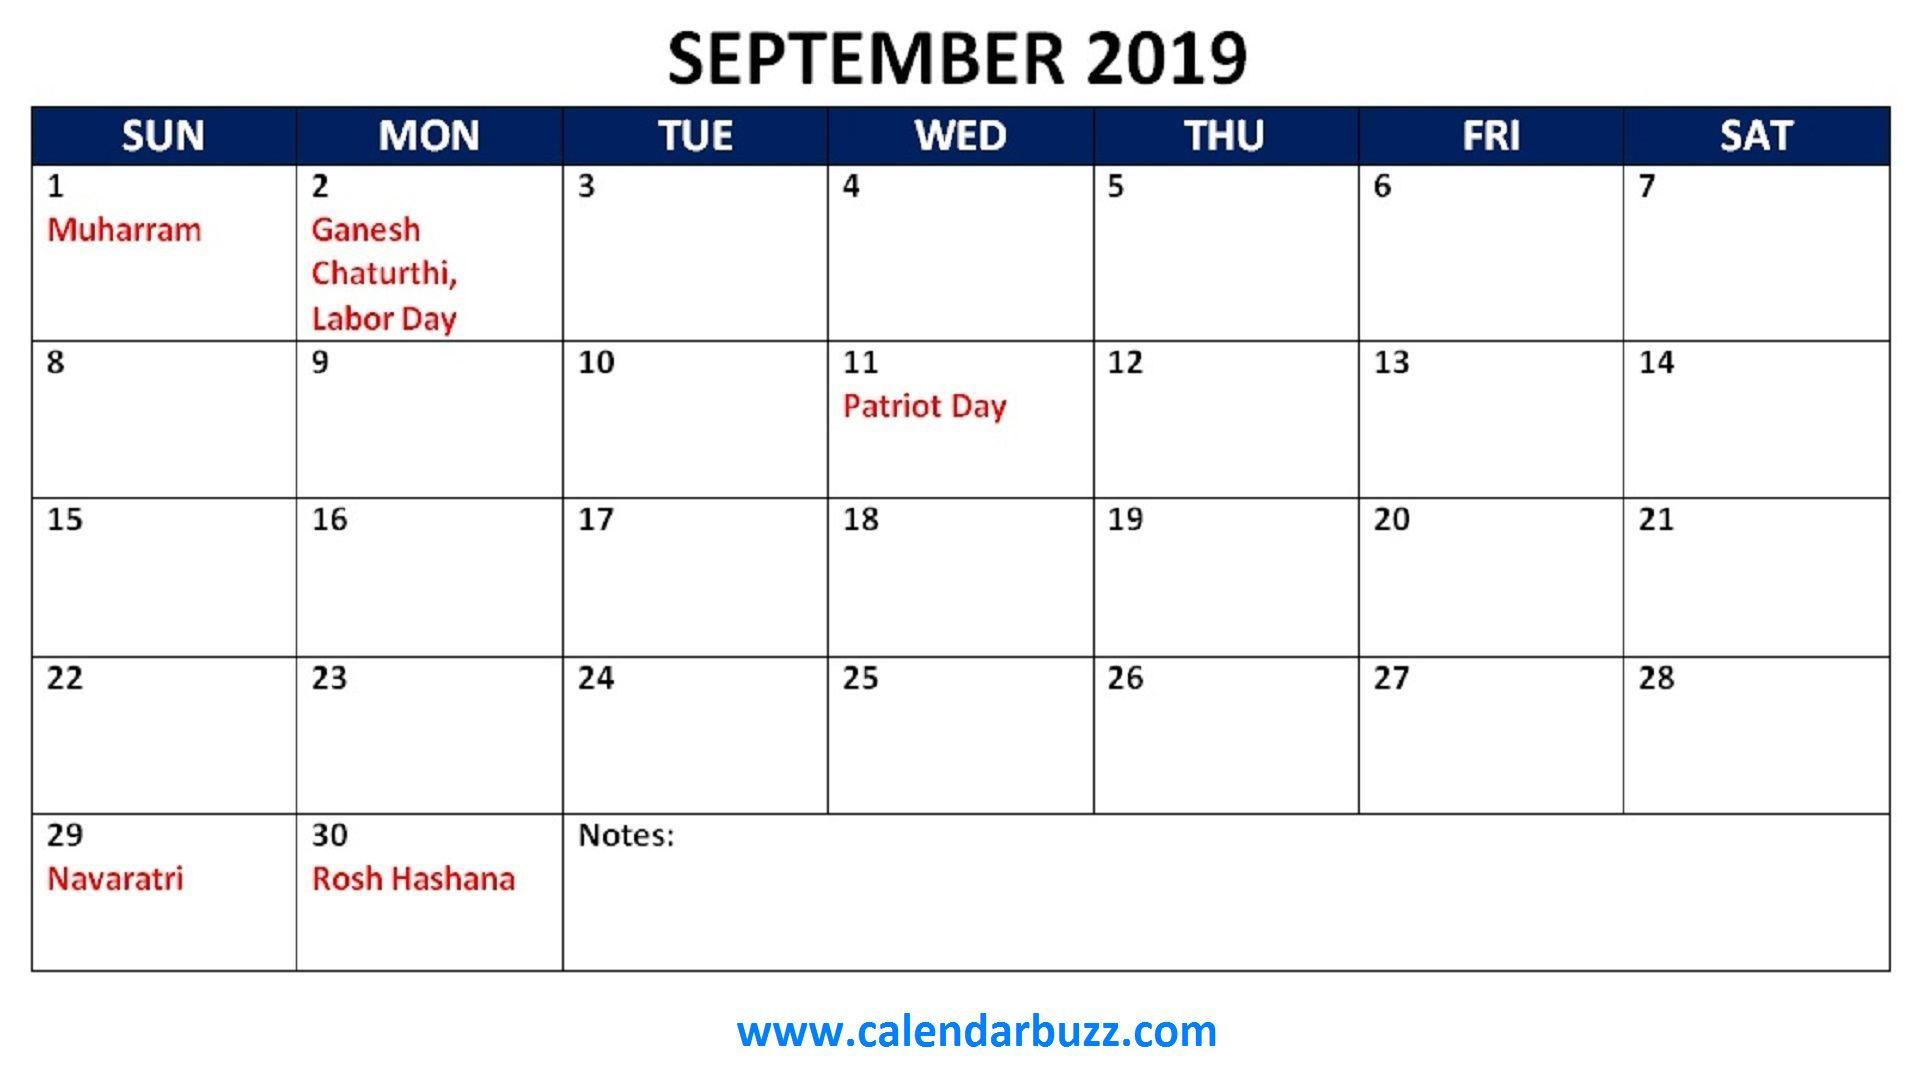 September 2019 Holidays Calendar Printable 2019 Calendars